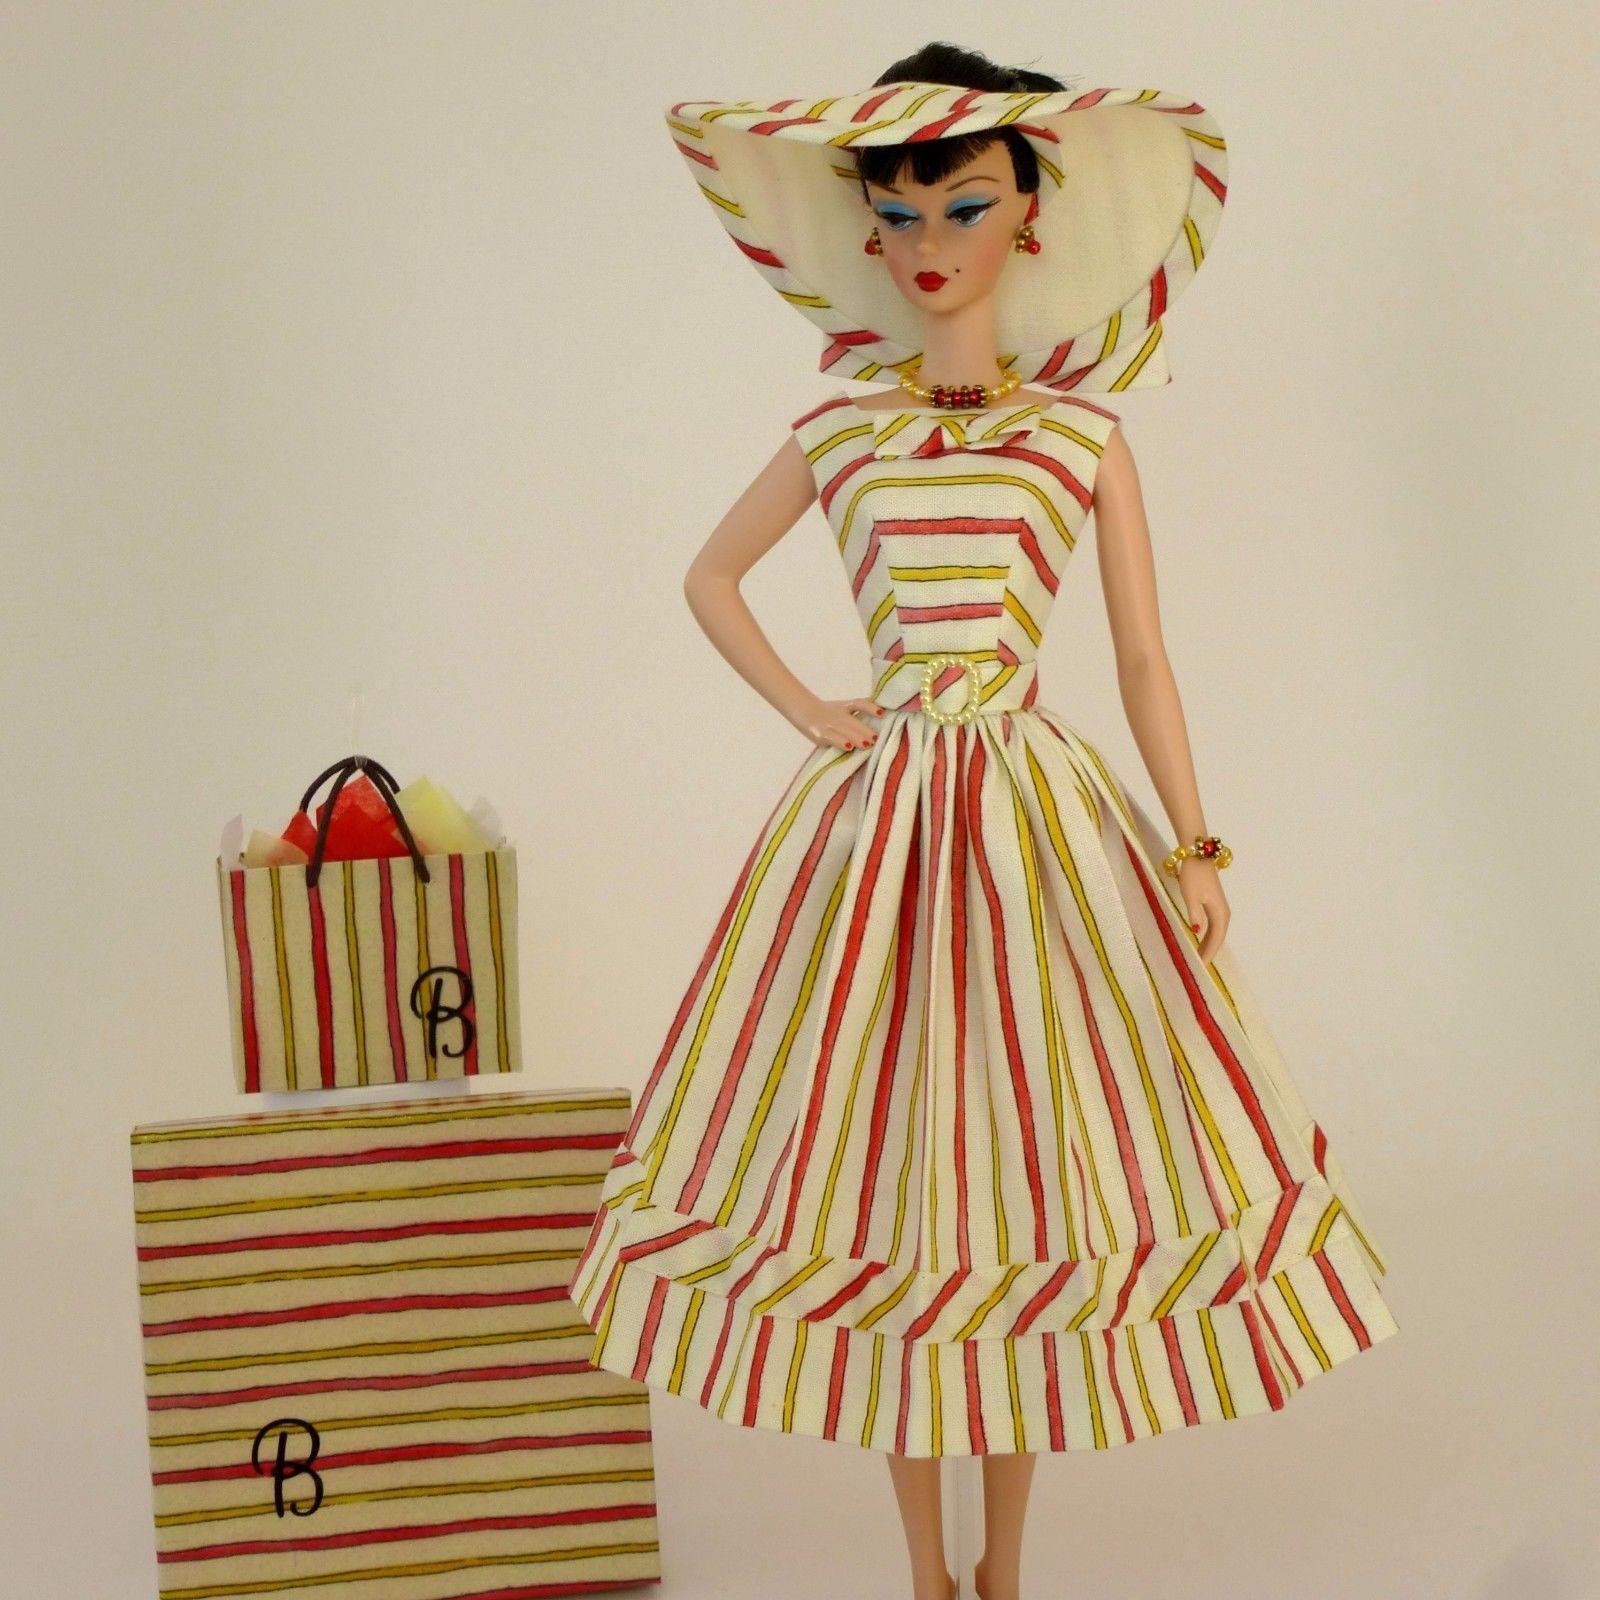 Ooak Handmade Vintage Barbie Silkstone Fashion By Roxy Rayelle Ebay Vintage Barbie Barbie Fashion Barbie Dress